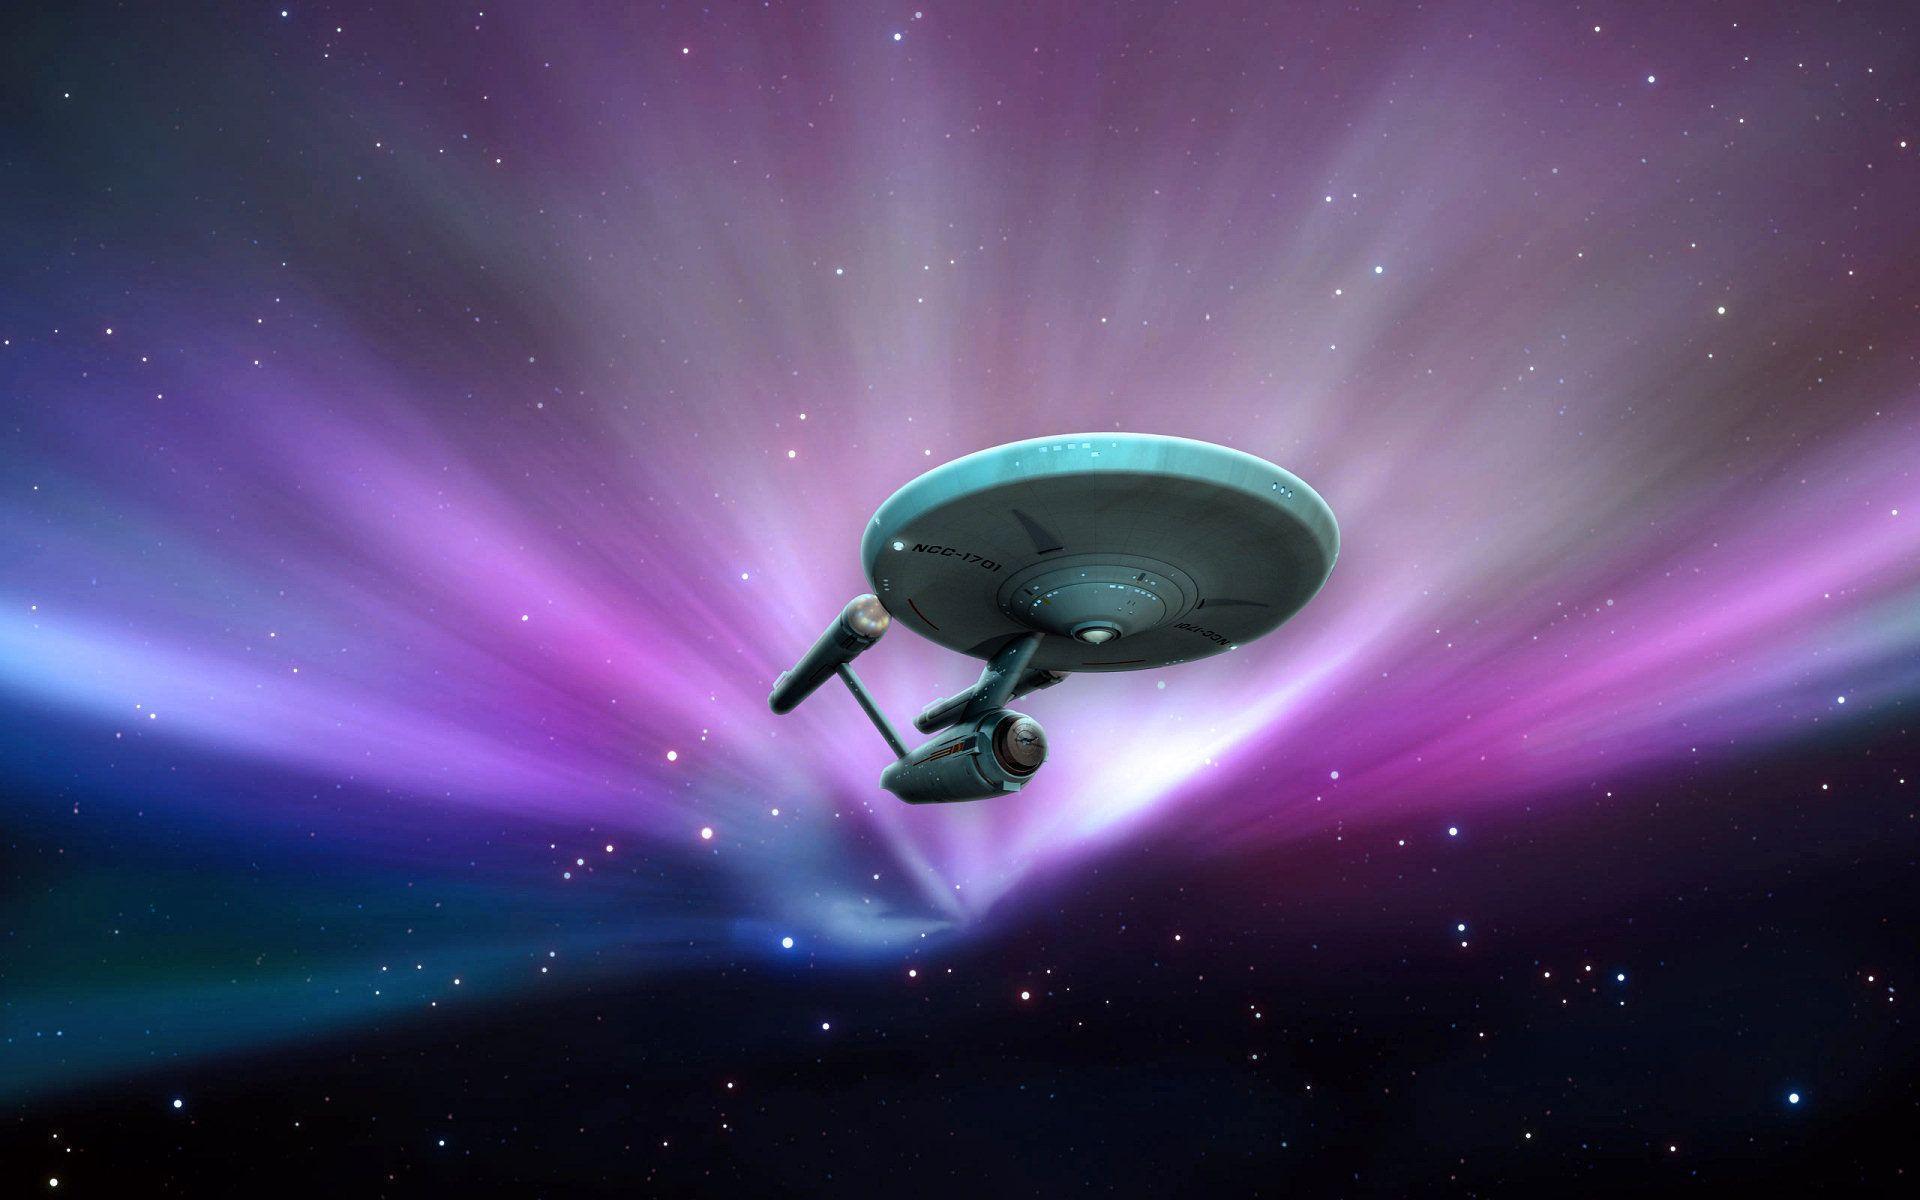 Star Trek Backgrounds - Wallpaper Cave